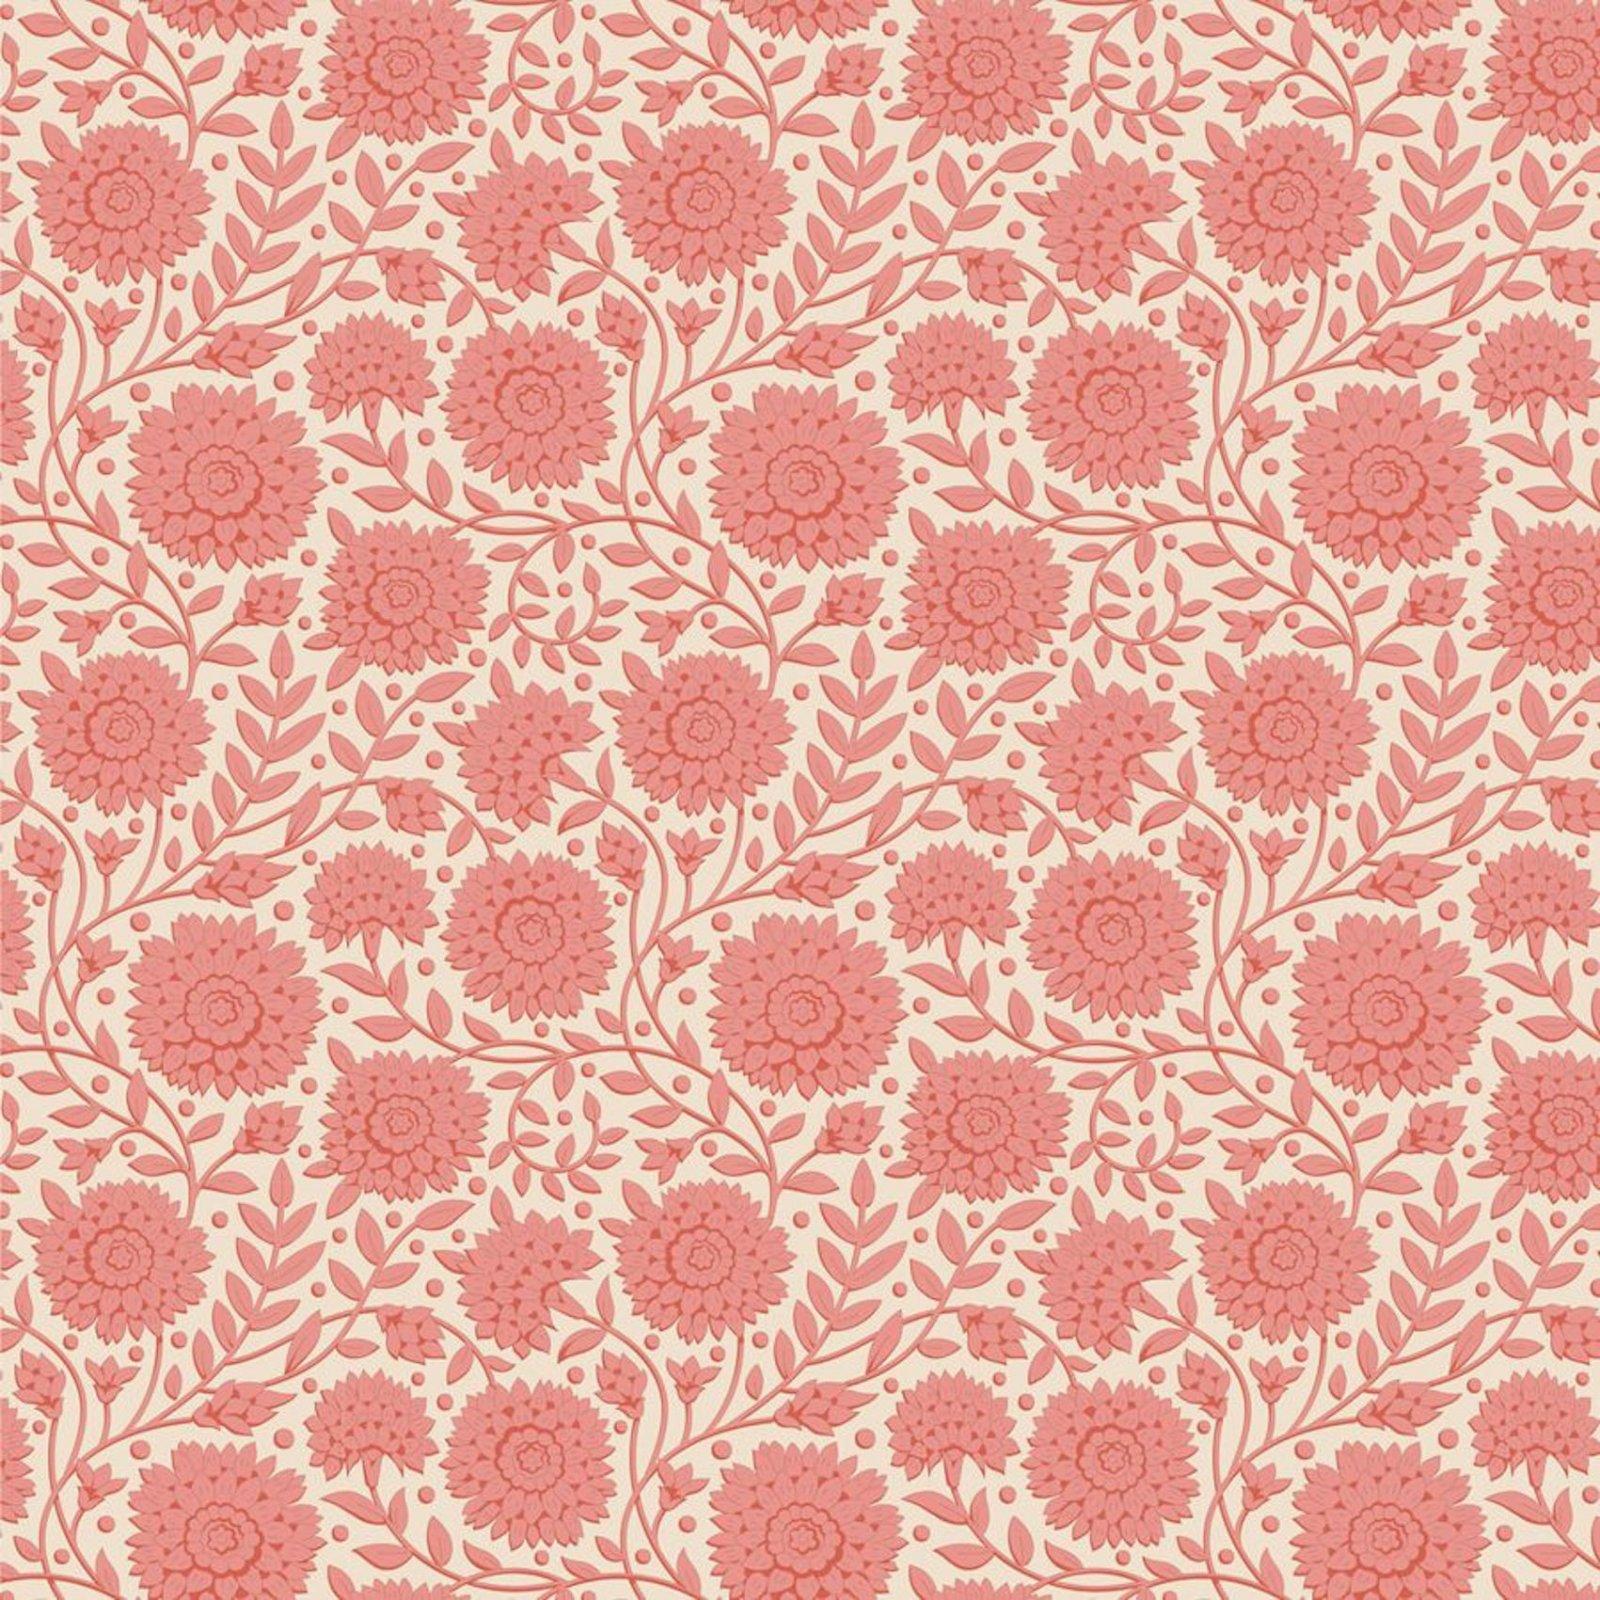 PRE-ORDER  - Tilda - Windy Days - Aella Floral Coral